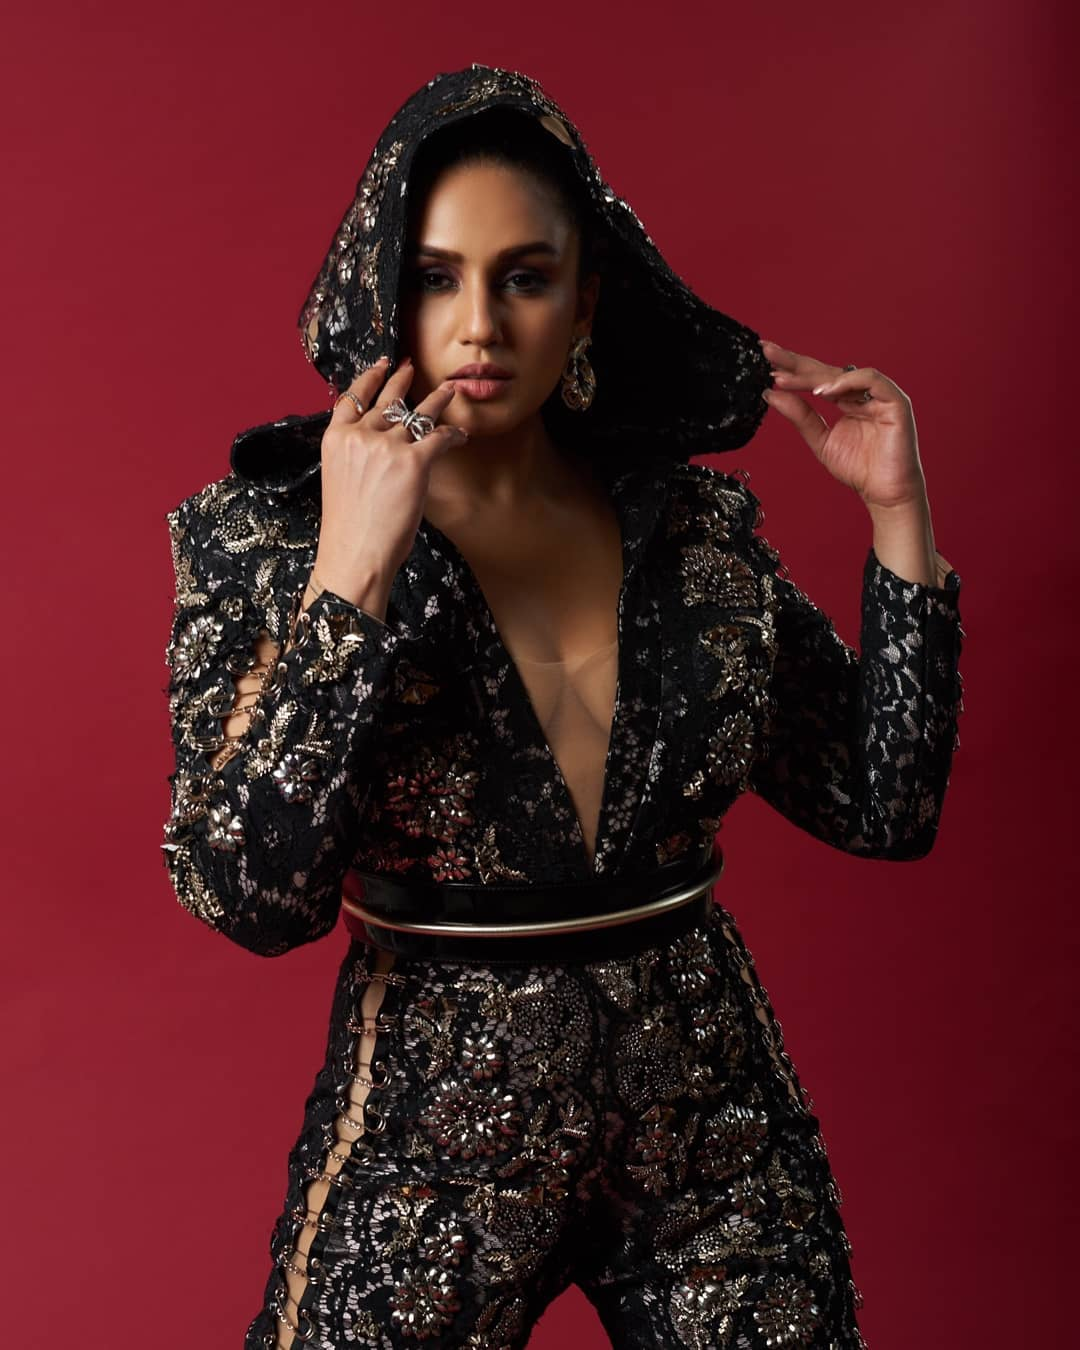 Huma qureshi bollywood actress 36